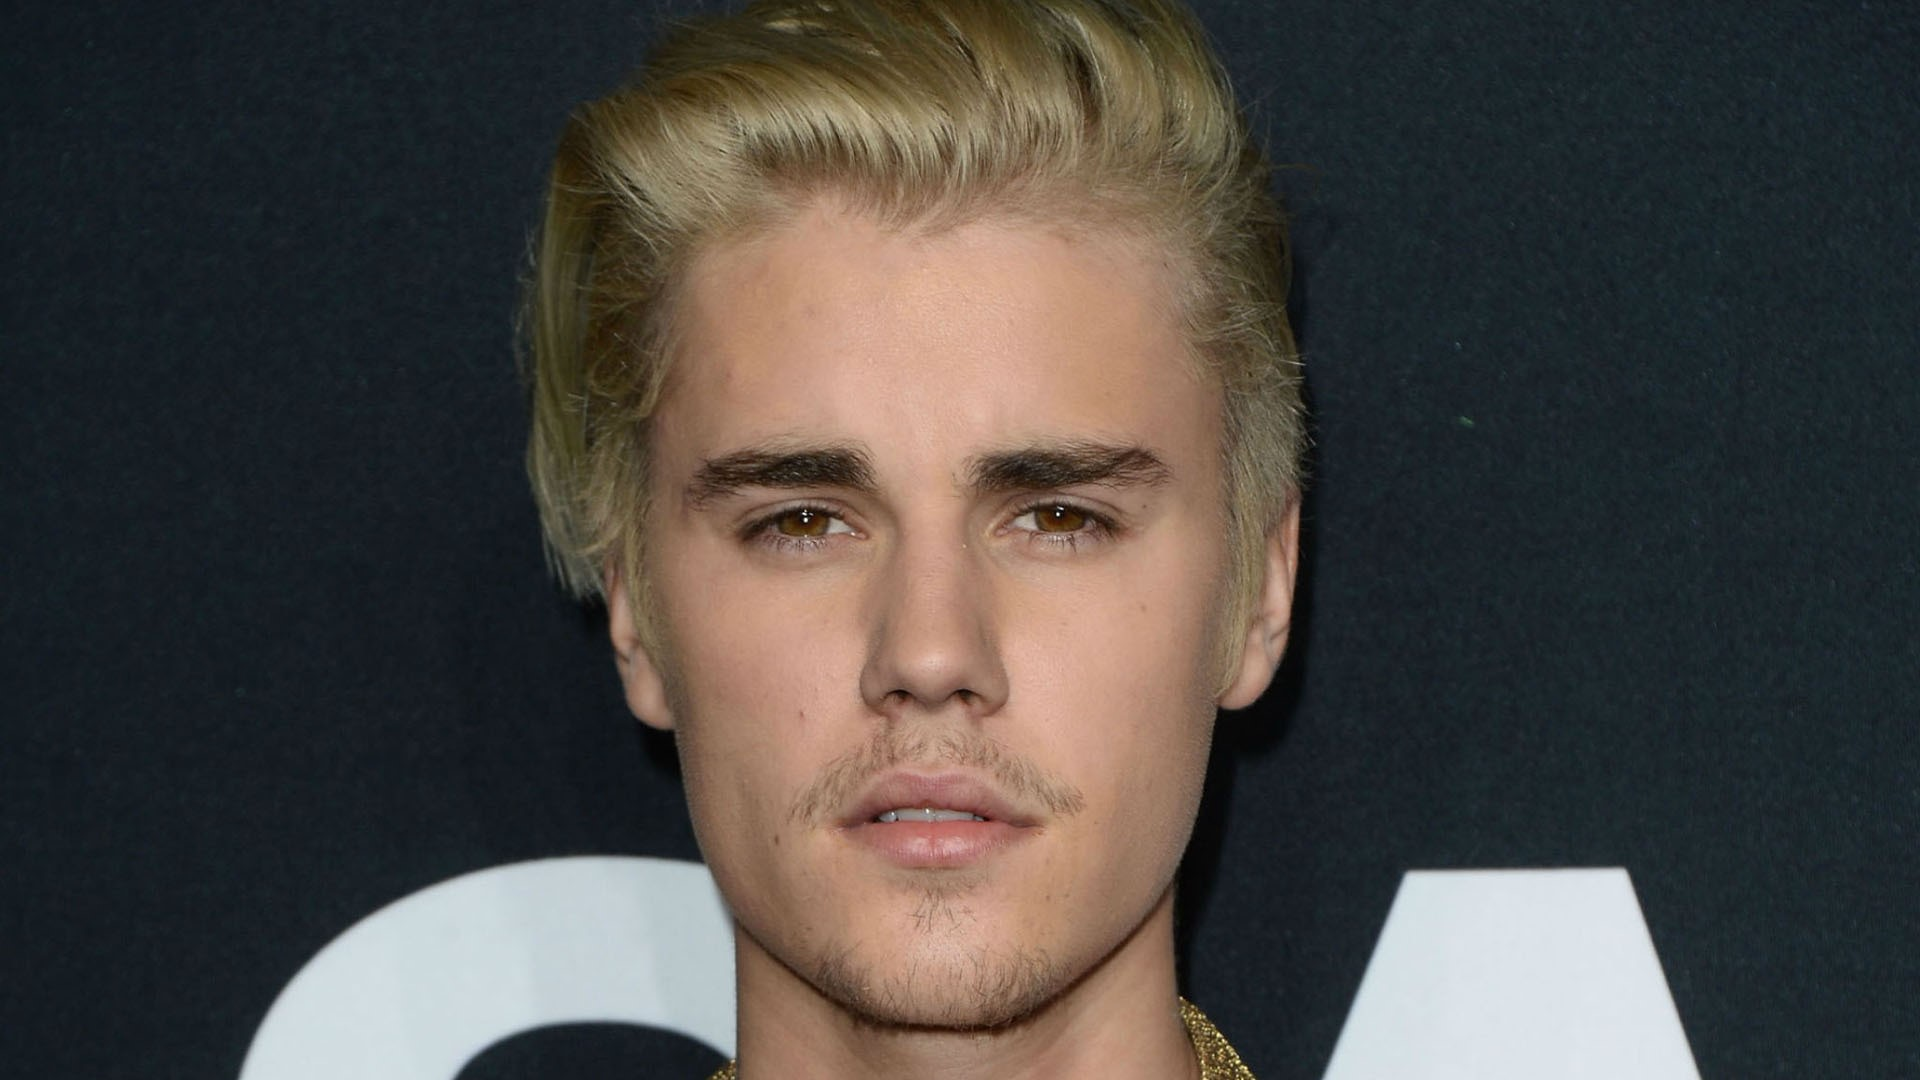 Justin Bieber Wallpapers 5